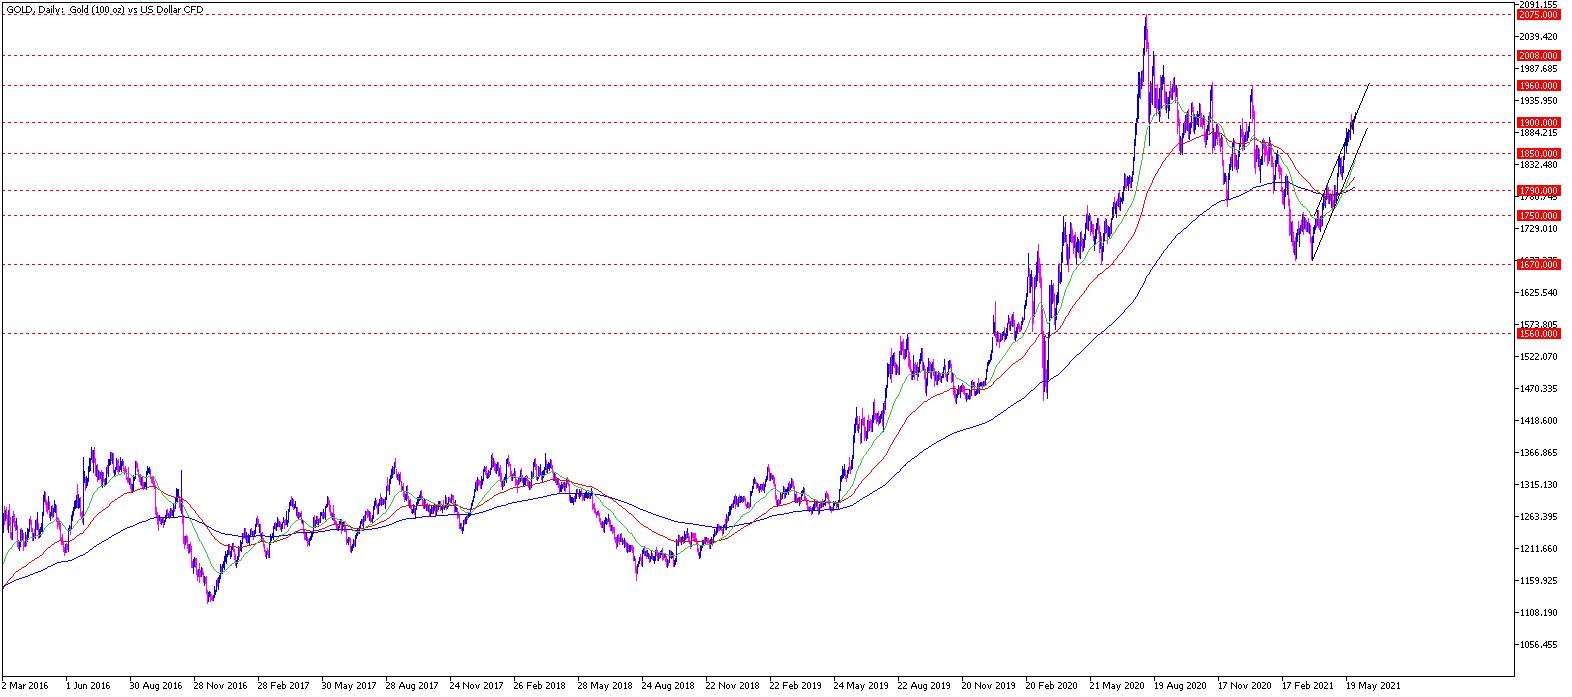 Gold Chartanalyse daily am 01.06.21 - Gold Prognose